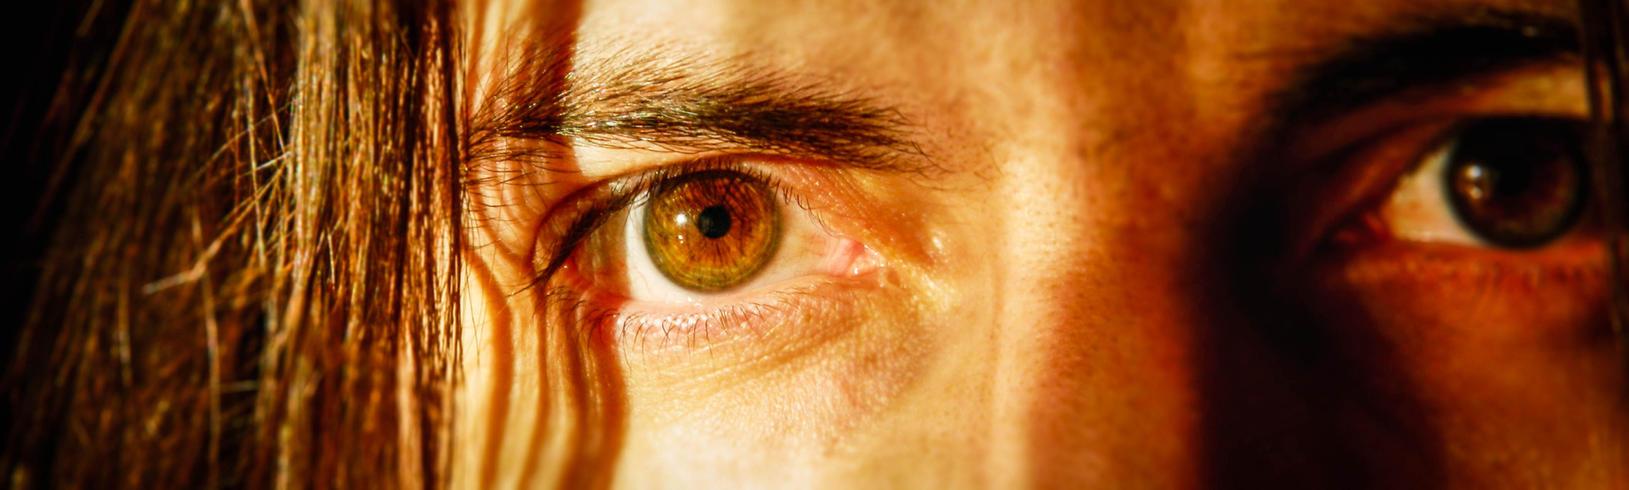 Seeing through me by Thanatos-ARG